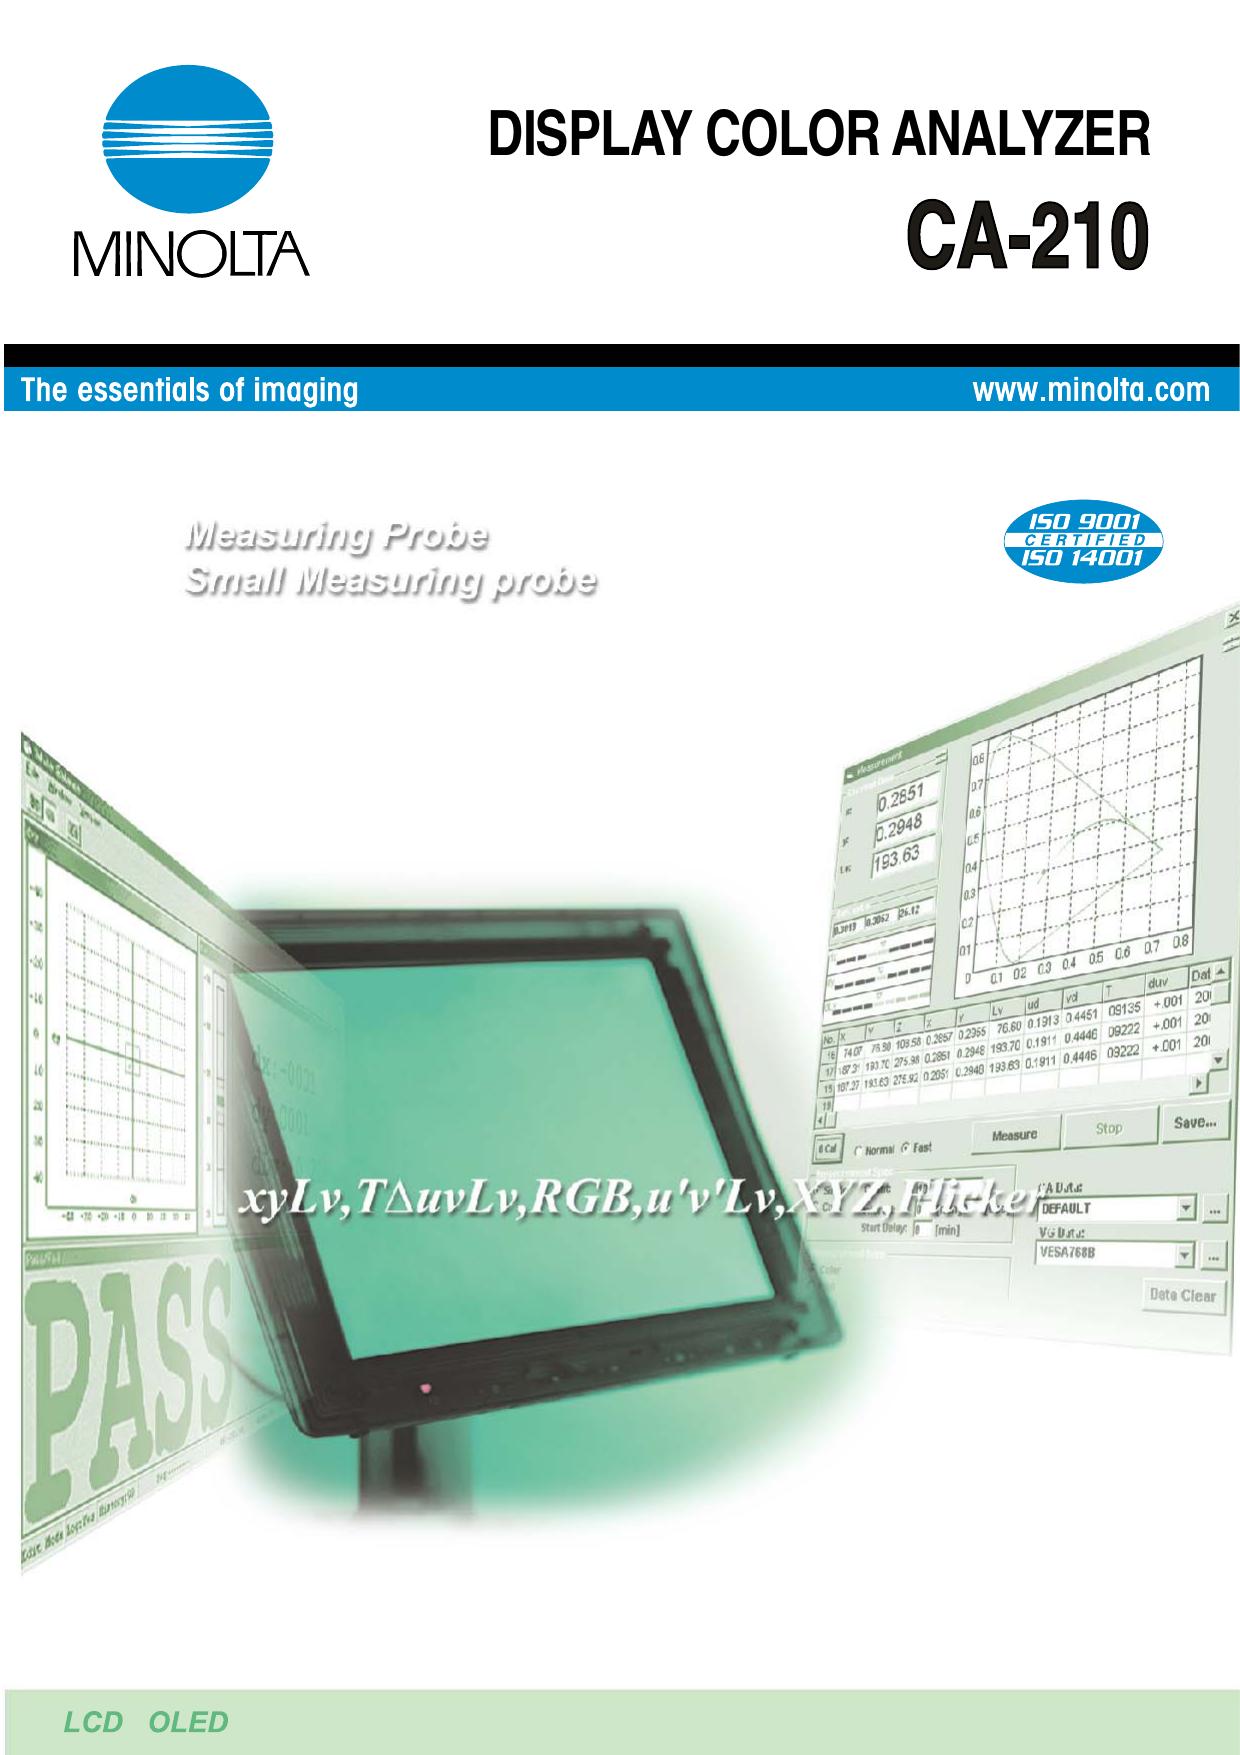 CA-P12//15 2m LCD Flicker Measuring Probe for Minolta CA210 Color Analyzer Tested